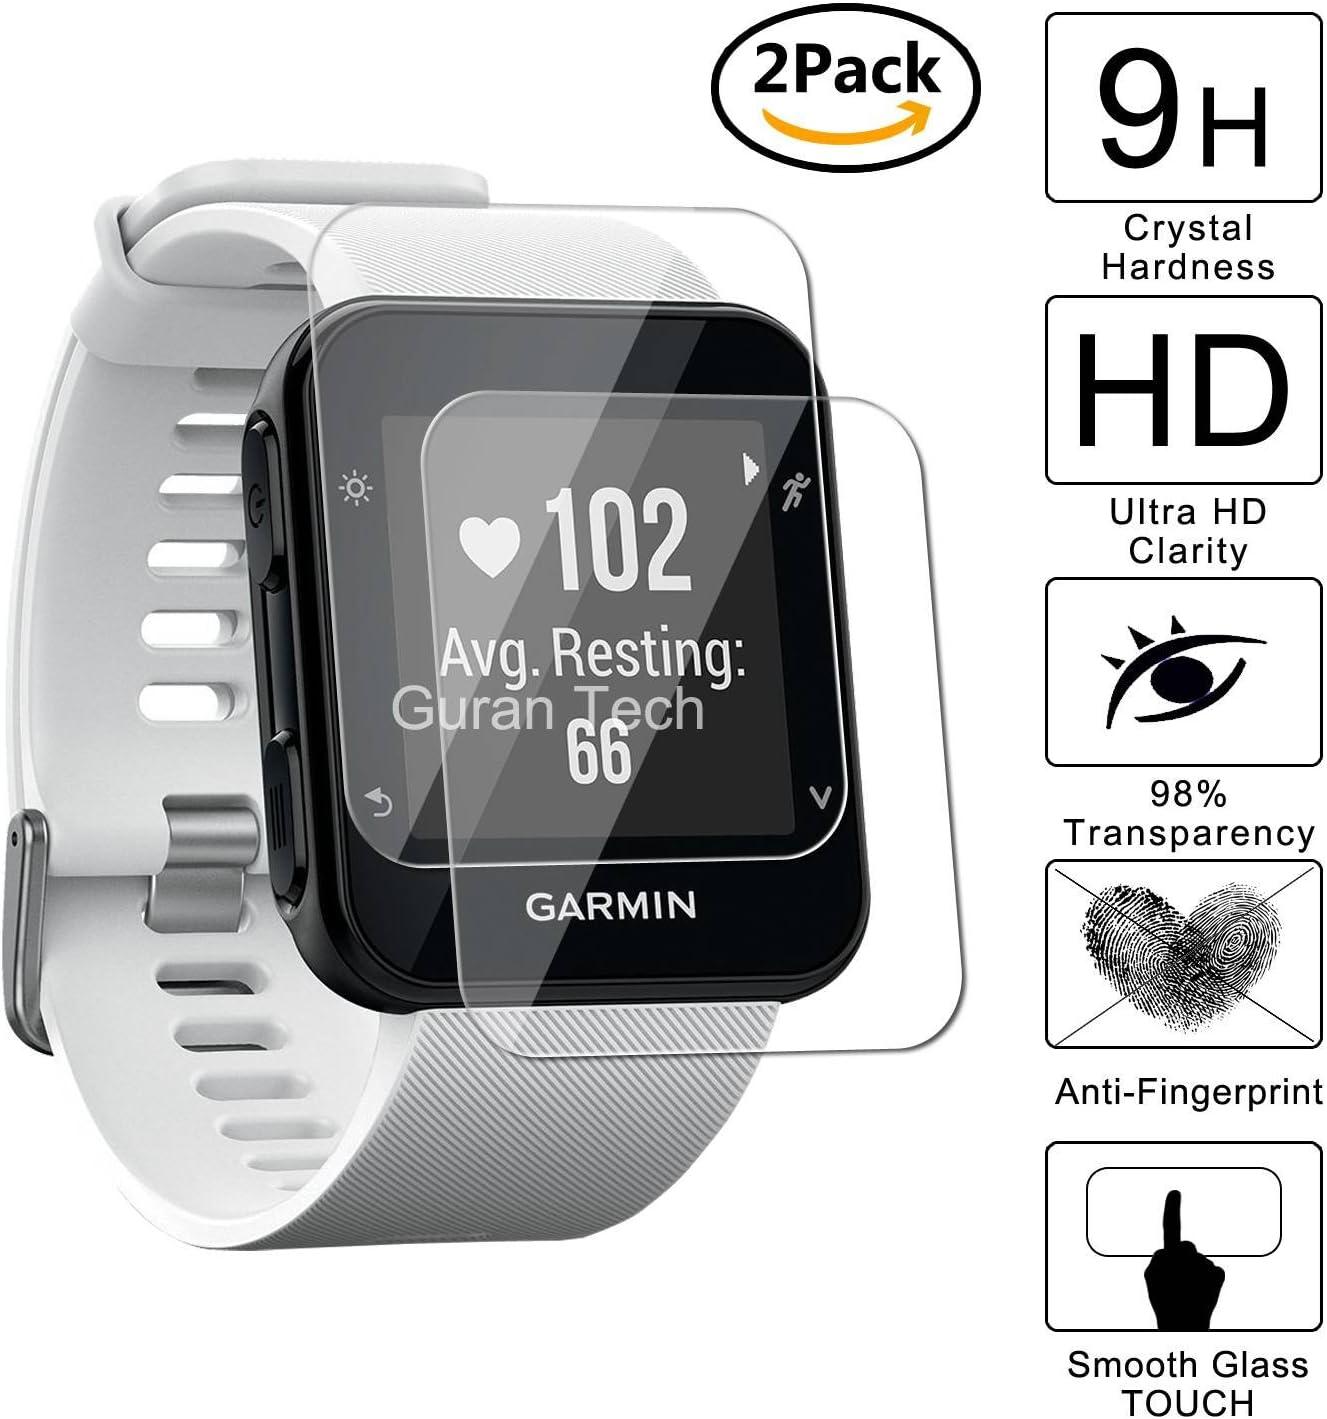 Guran [2 Pack] Protector de Pantalla Vidrio Cristal Templado Para Garmin Forerunner 35 Smartwatch Cristal Vidrio Templado Film: Amazon.es: Electrónica